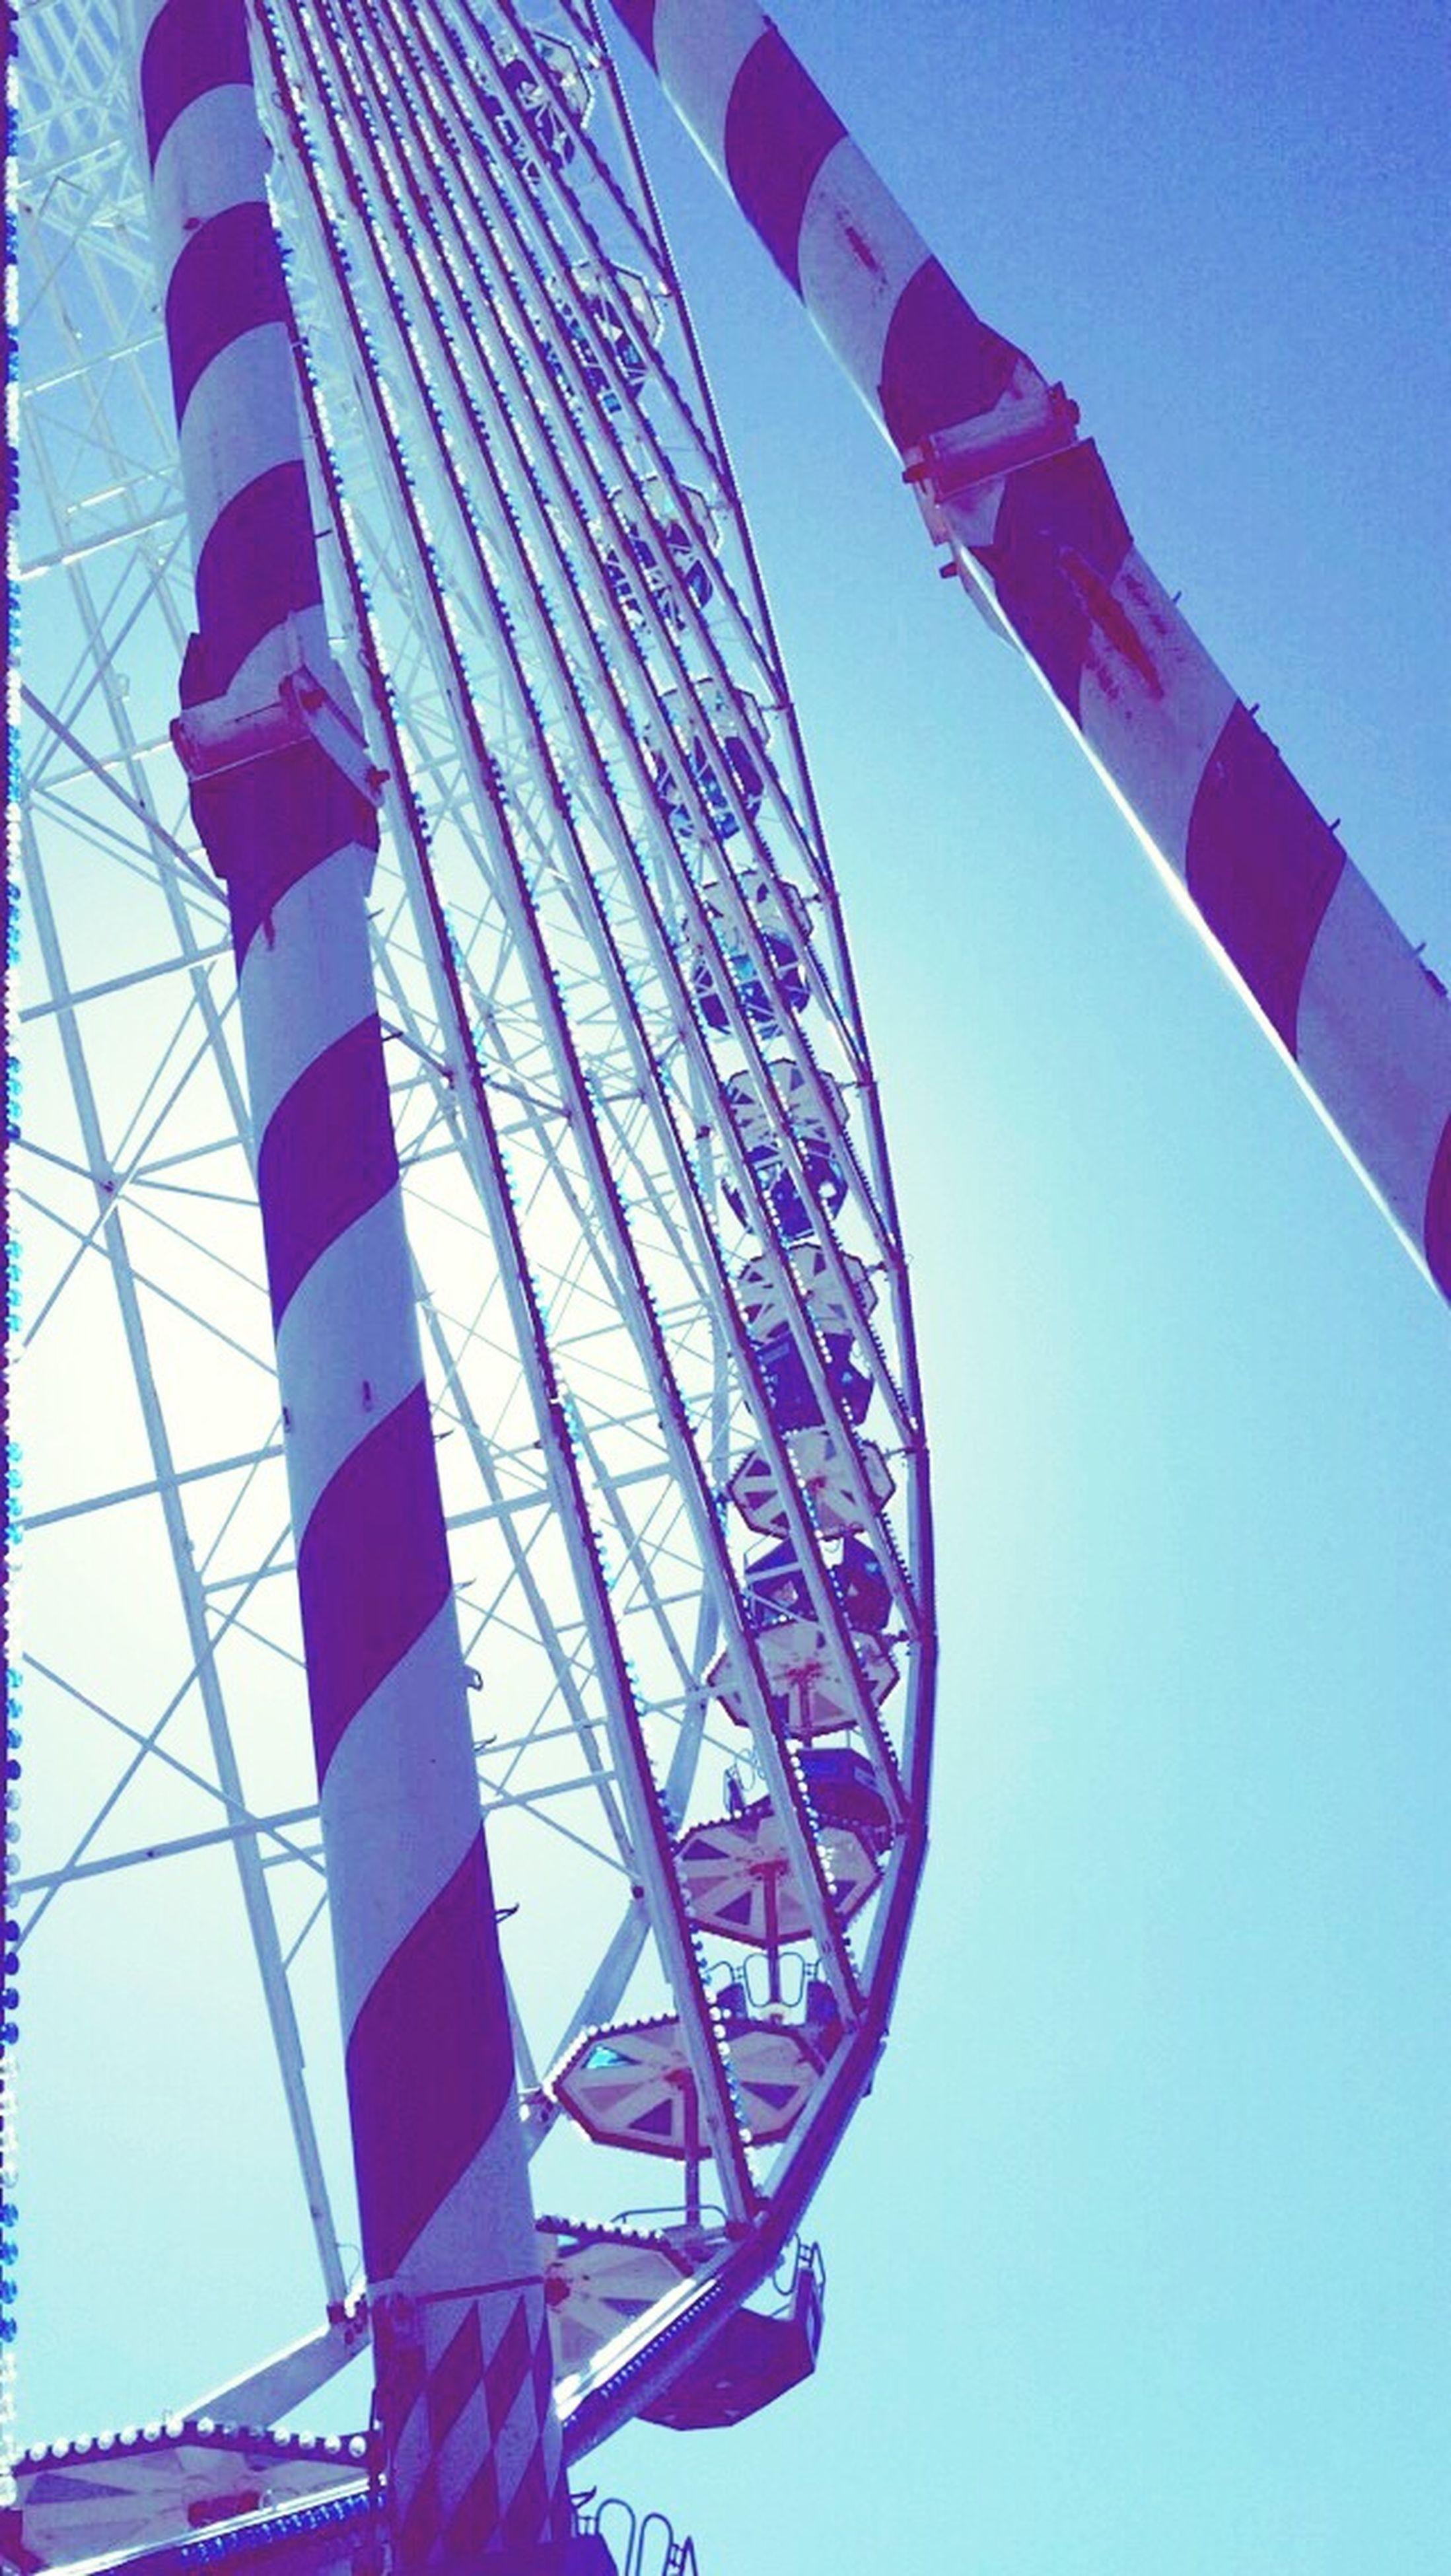 low angle view, blue, clear sky, multi colored, built structure, architecture, sky, amusement park, ferris wheel, circle, arts culture and entertainment, day, pattern, copy space, flag, famous place, travel destinations, outdoors, tourism, design